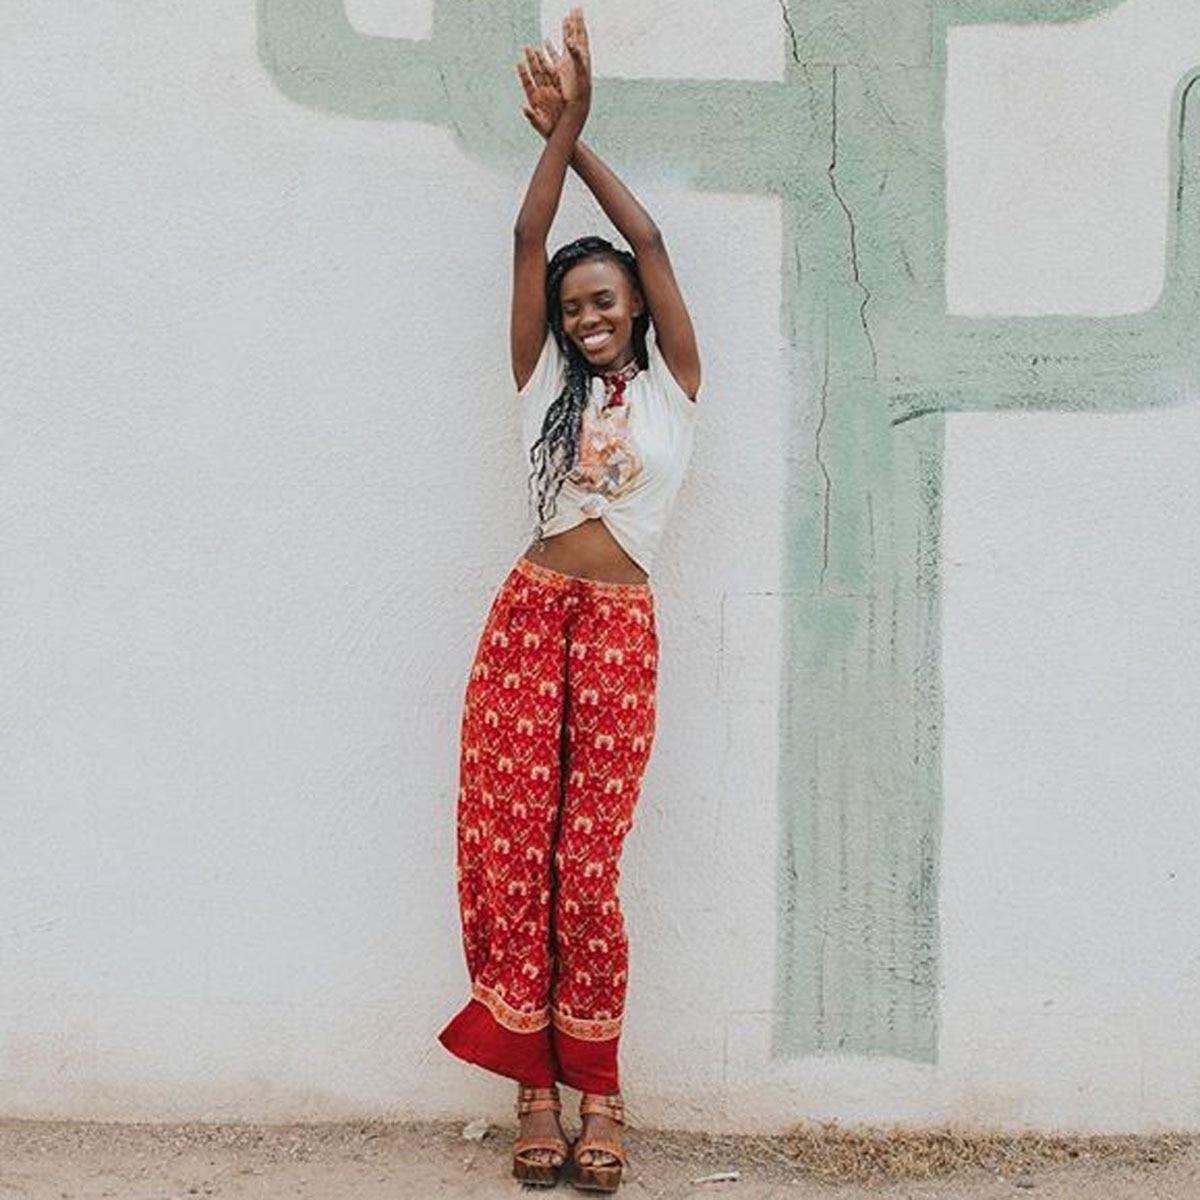 Jastie 2018 Bohemian Summer Pant Red Floral Print Women Pants Casual Elastic Waist Wide Leg Trousers Boho Hippie Female Clothing